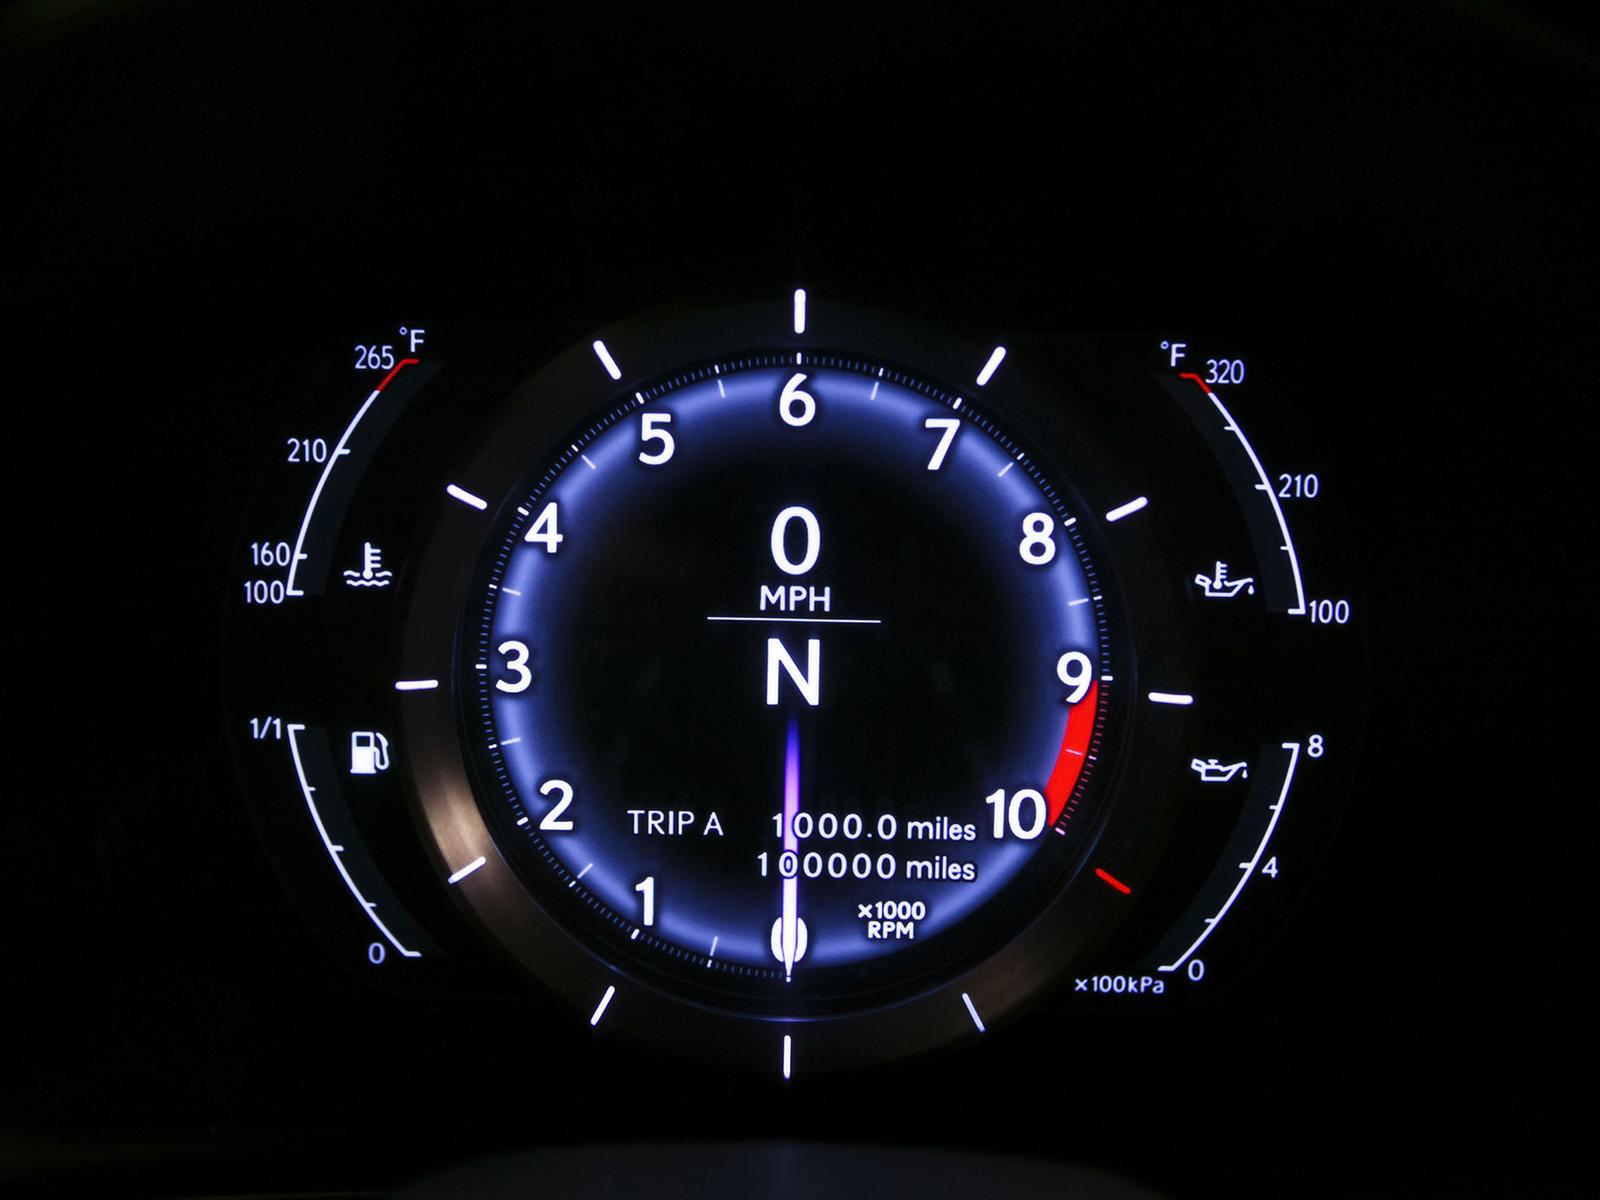 http://1.bp.blogspot.com/_W0T_5cgsywY/S_Xpch4zpkI/AAAAAAAAAAw/IA4RBqfilvs/s1600/2007-Lexus-LF-A-Sports-Car-Concept-Gauge-1600x1200.jpg